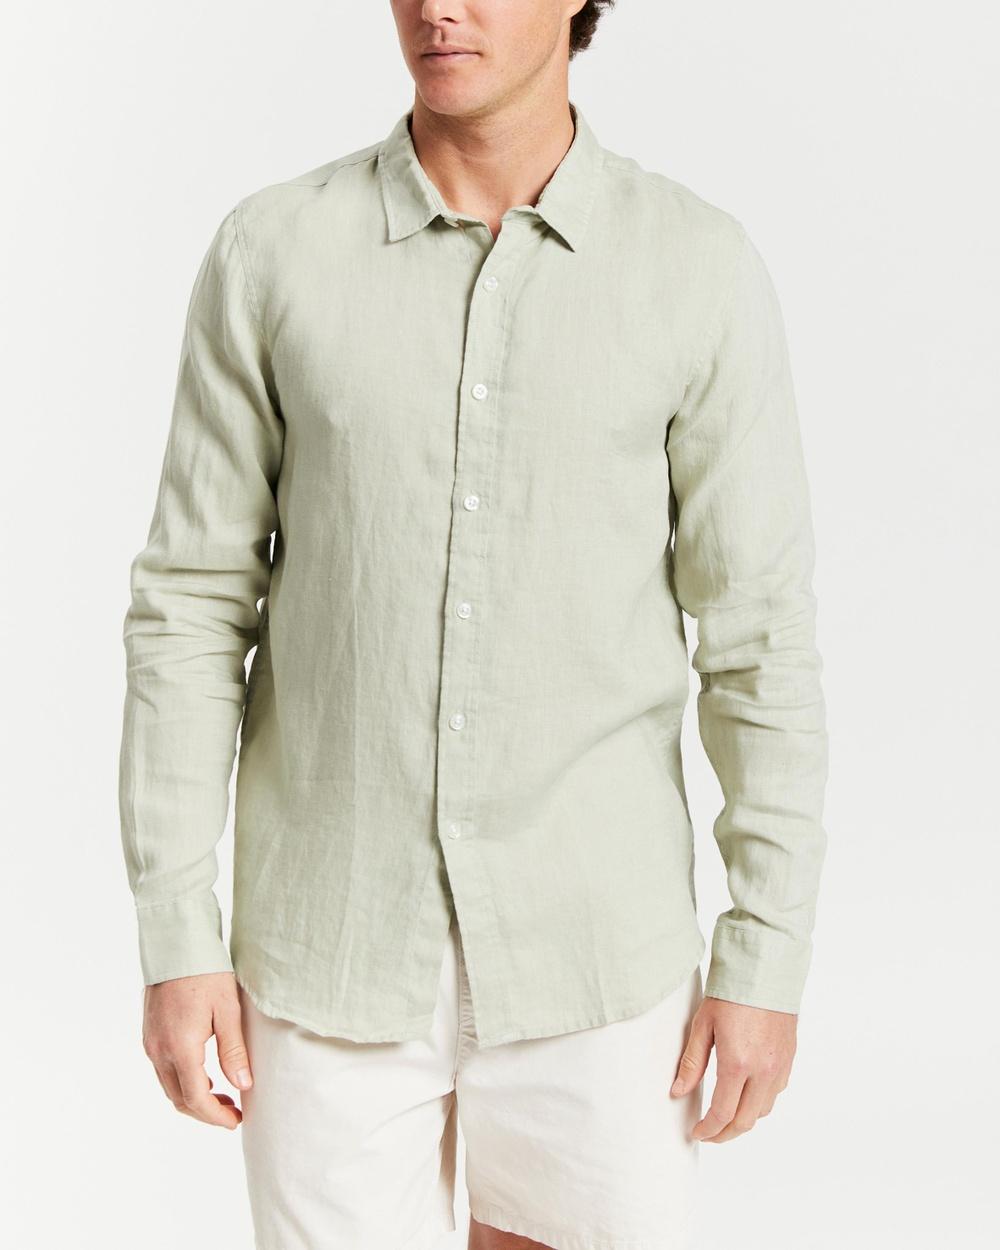 AERE LS Linen Shirt Shirts & Polos Mint